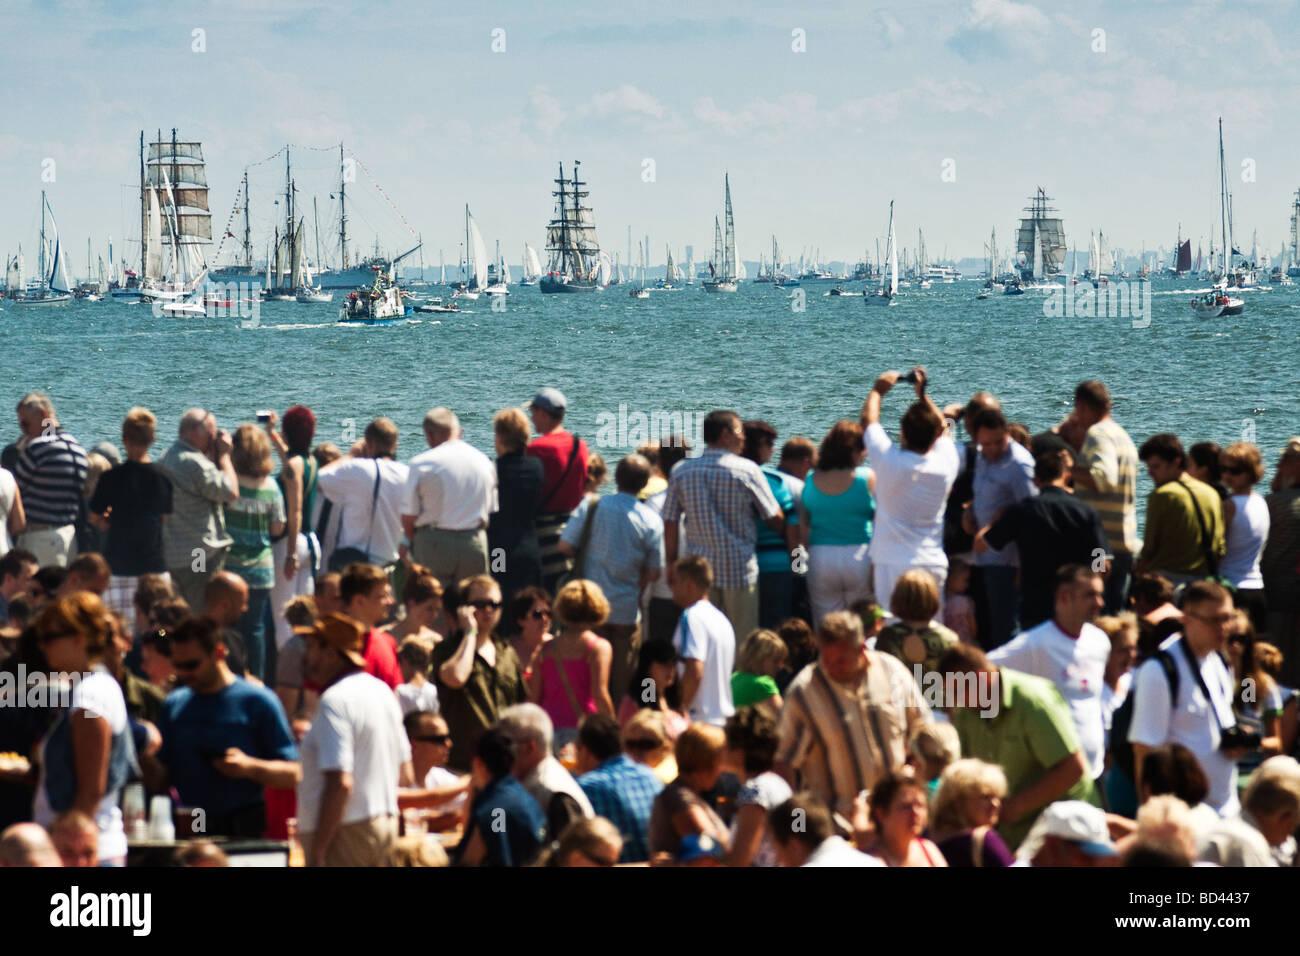 Spectators watching tall ships Cutty Sark Gdynia, Poland 05.07.2009 - Stock Image